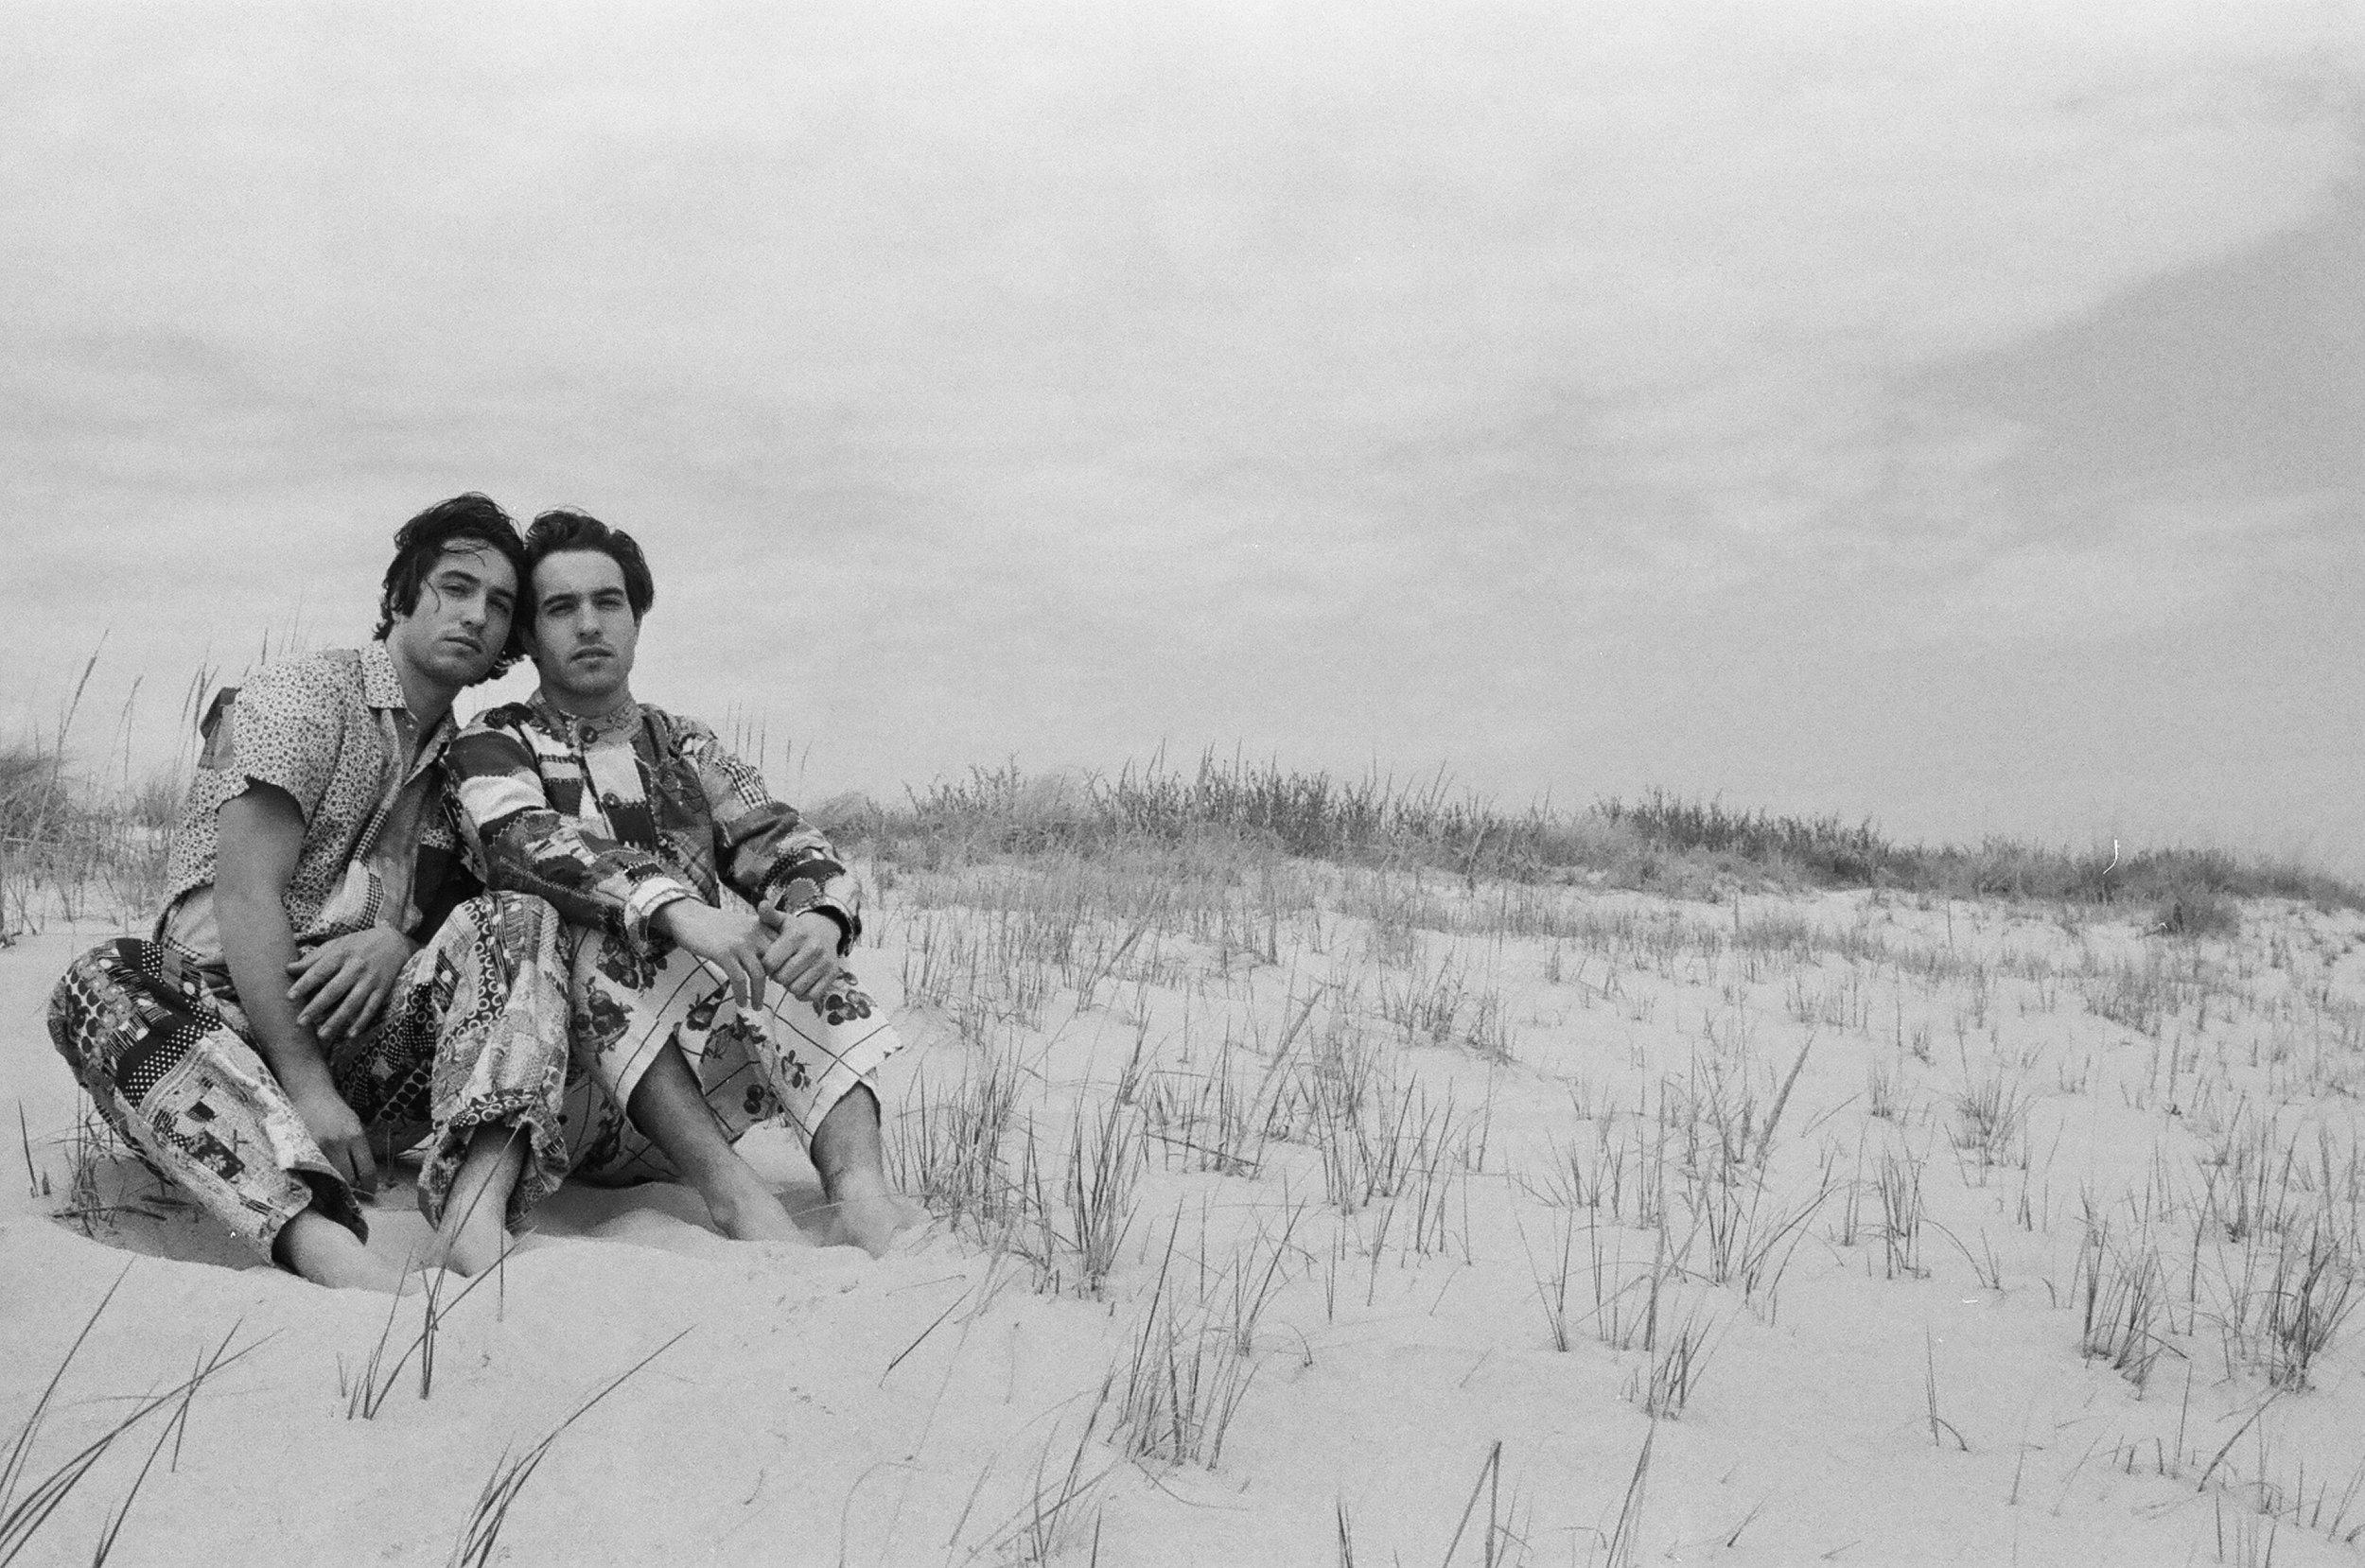 Chelsy-Mitchel-photographer-bode-nyc-fashion-beach-editorial.JPG